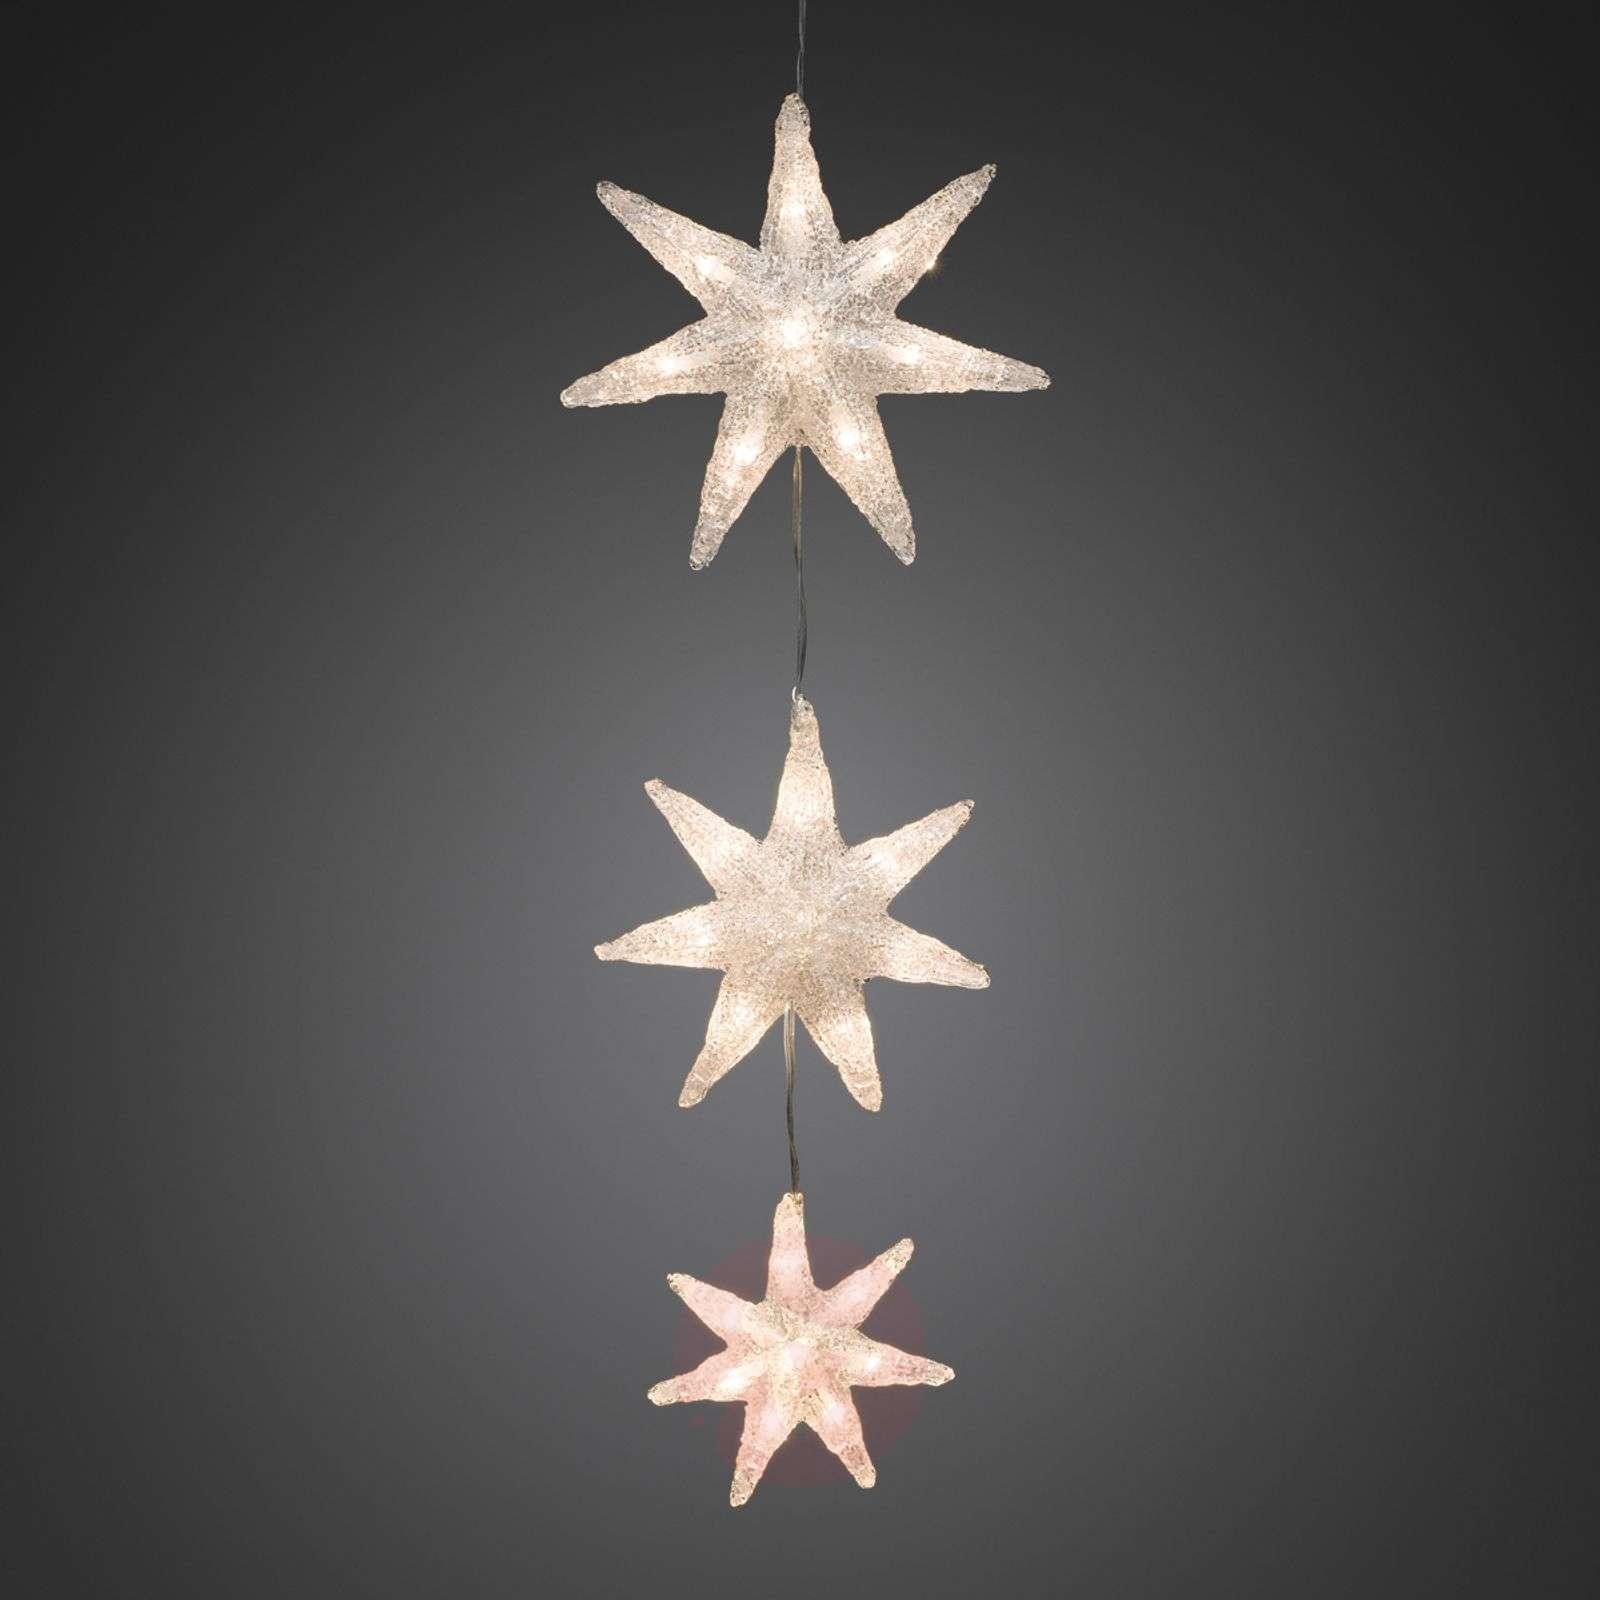 LED-valoverho tähdet, 24 lamppua-5524632-01